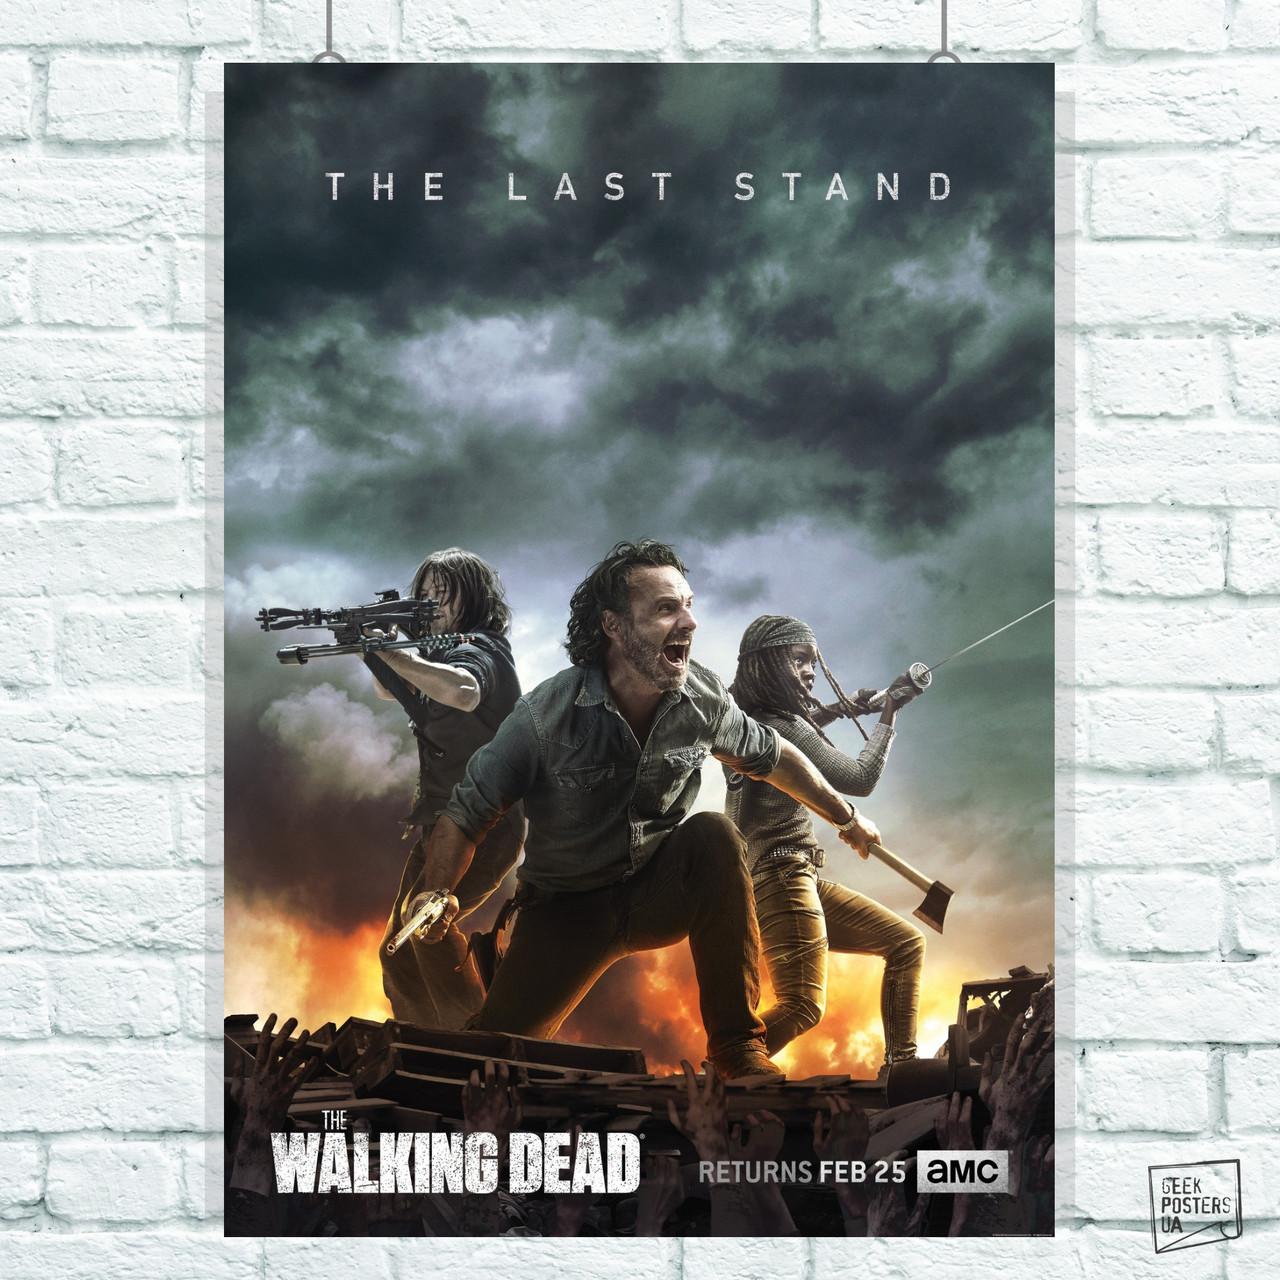 Постер The Walking Dead, Ходячие Мертвецы, сериал. Размер 60x42см (A2). Глянцевая бумага